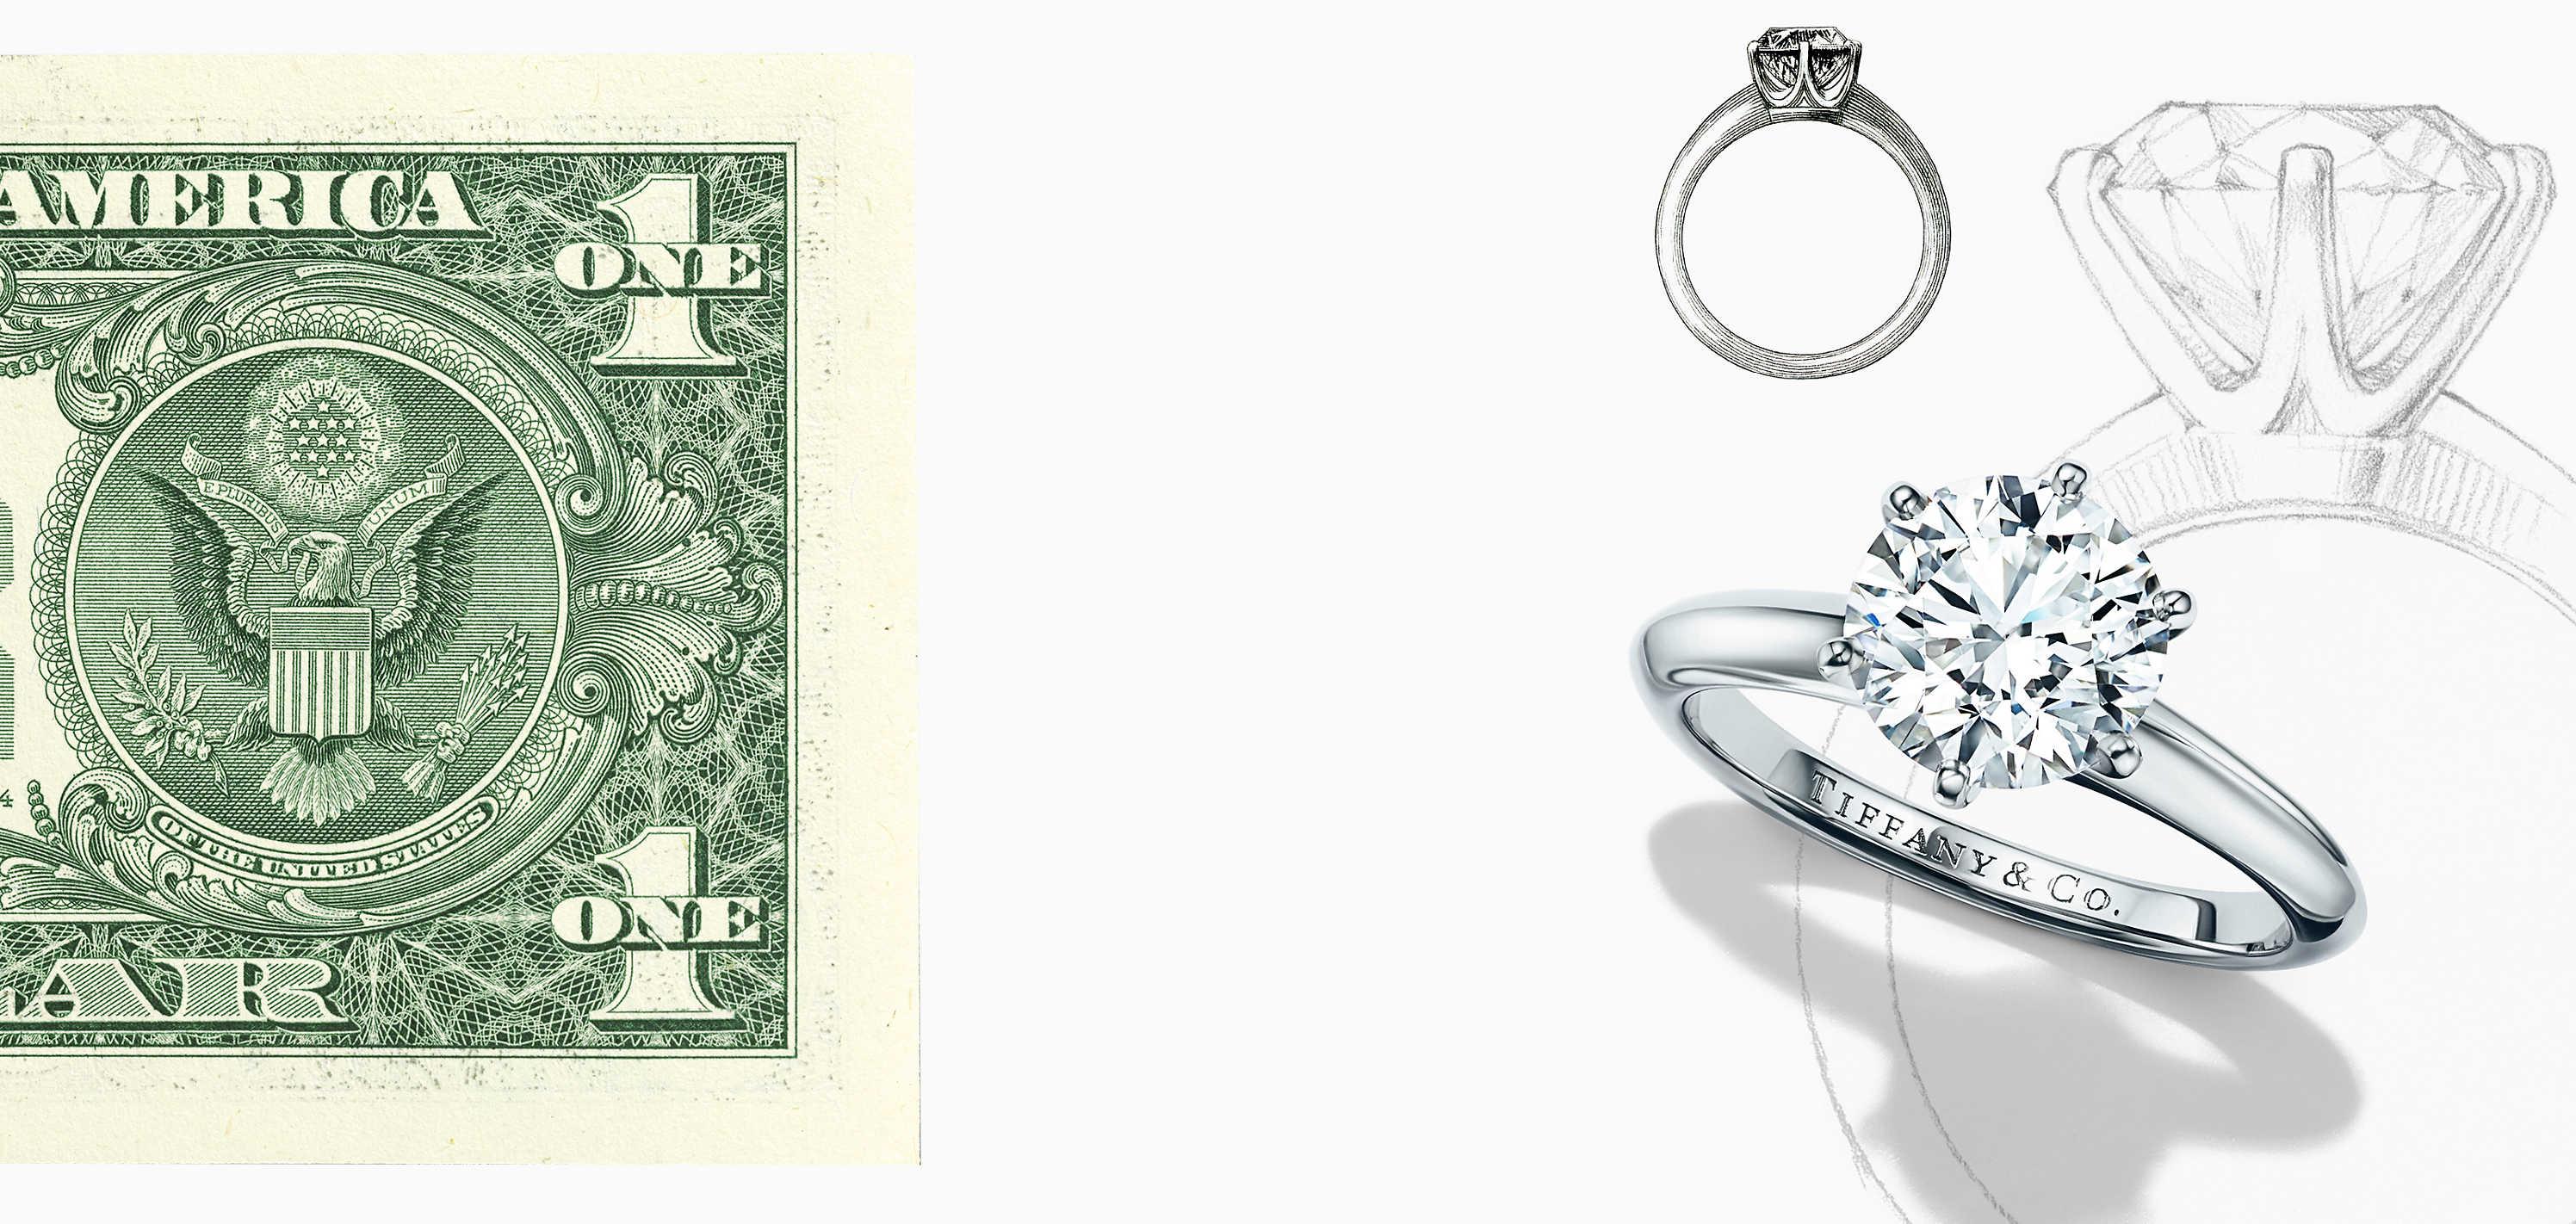 tiffany nota de dolar